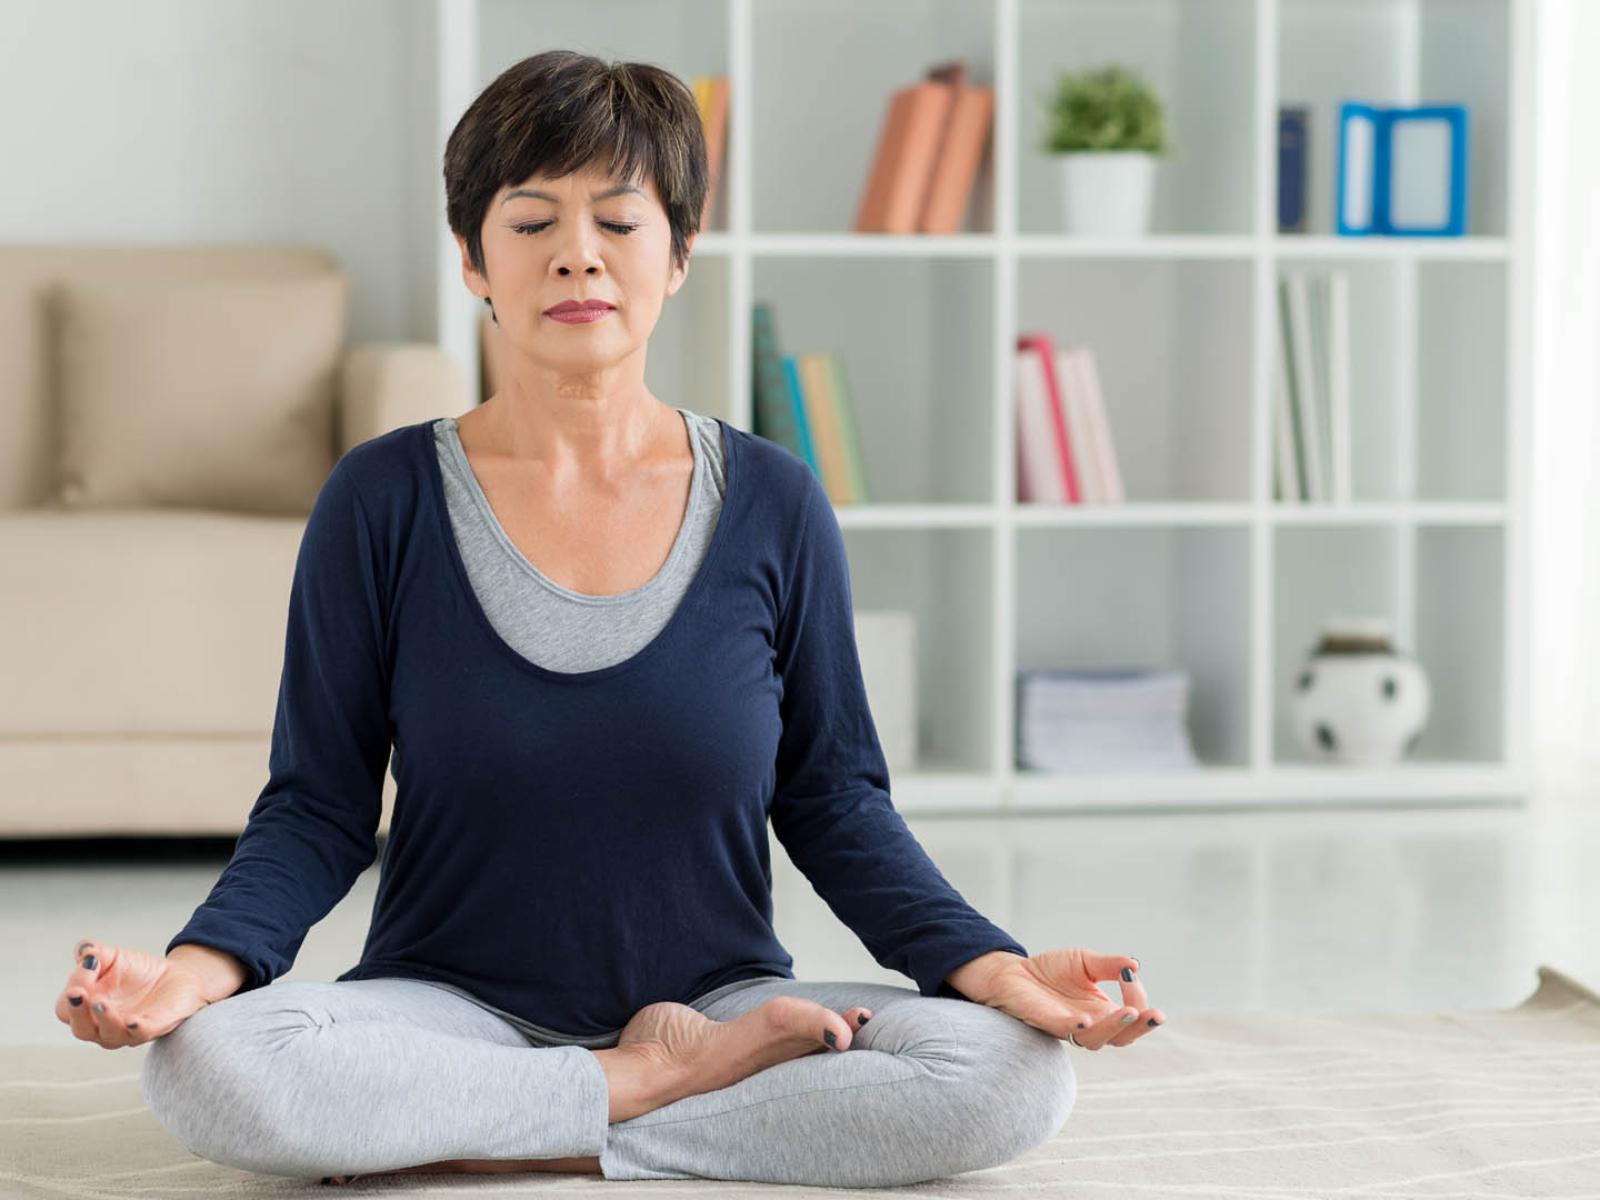 Mindfulness Οφέλη: Πώς να αγκαλιάσετε το mindfulness στην καθημερινότητά σας [vid]